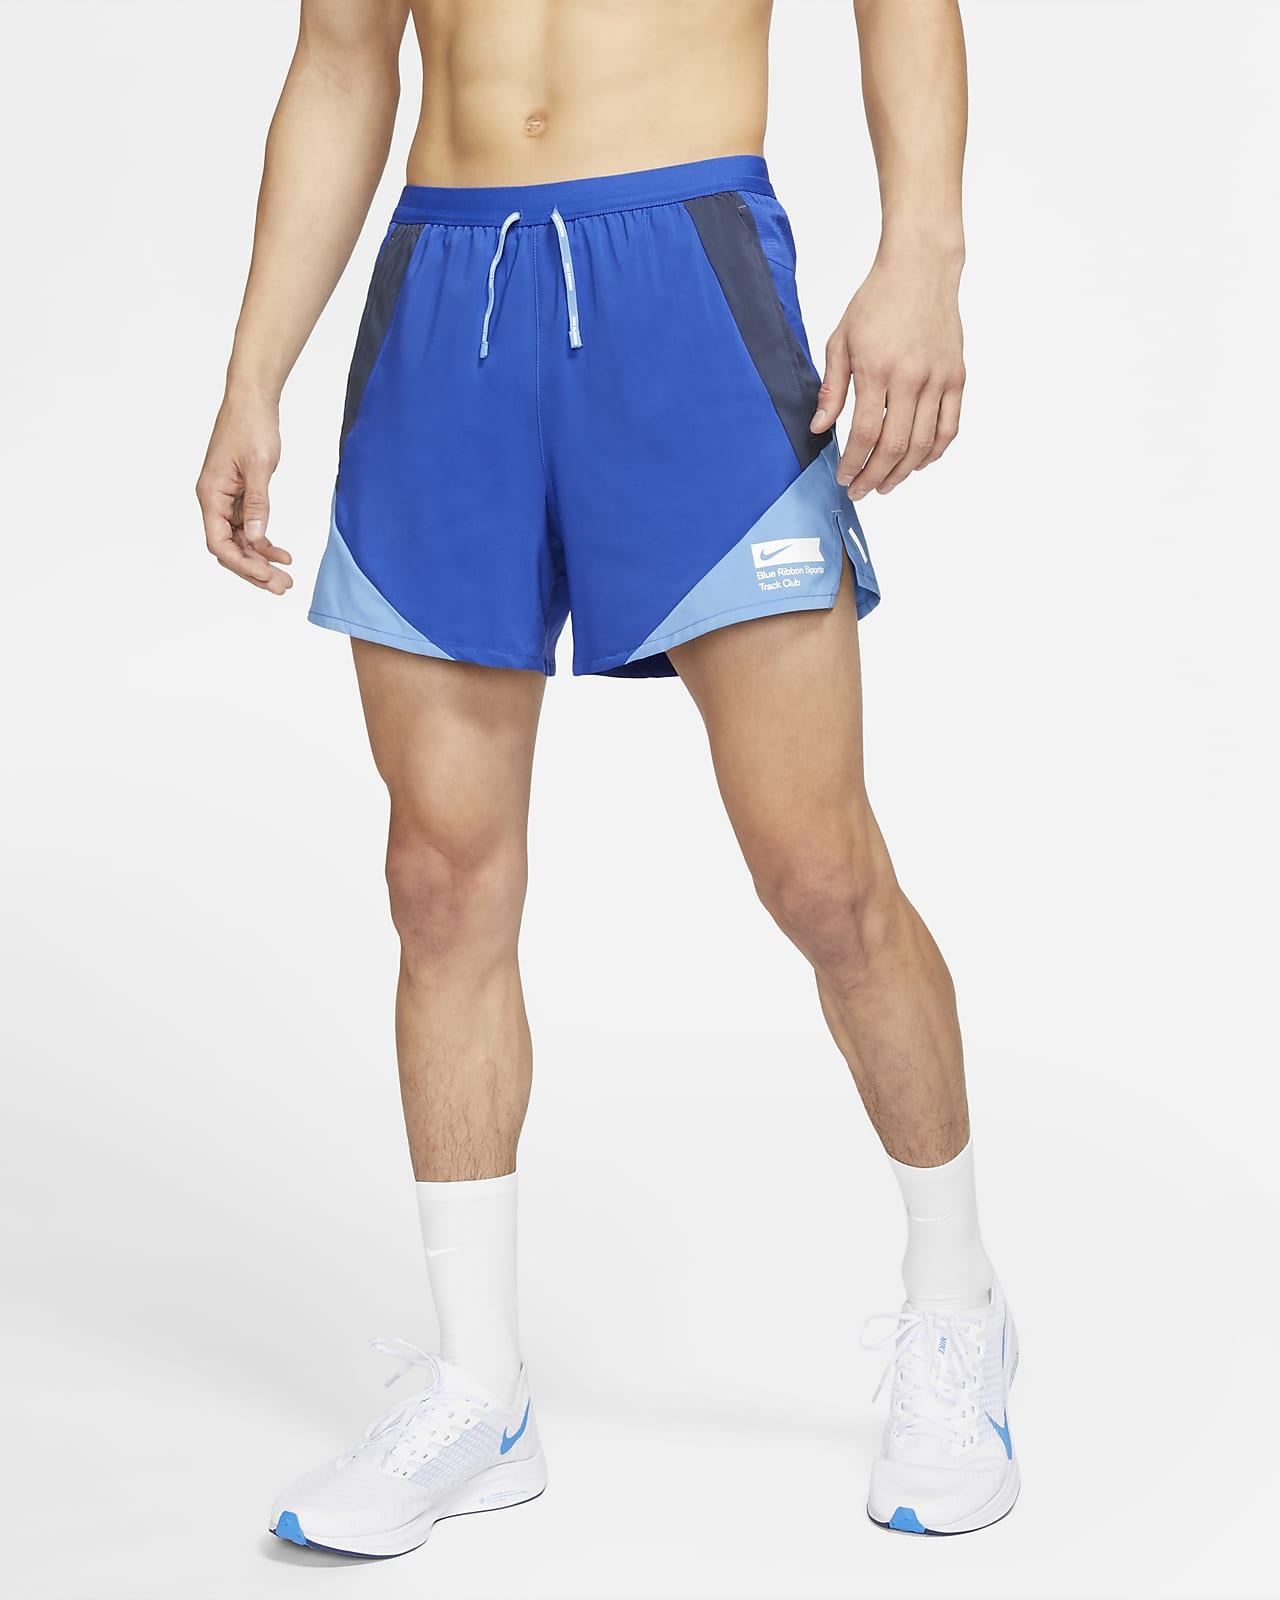 Nike Flex Stride BRS 男款帶襯跑步短褲